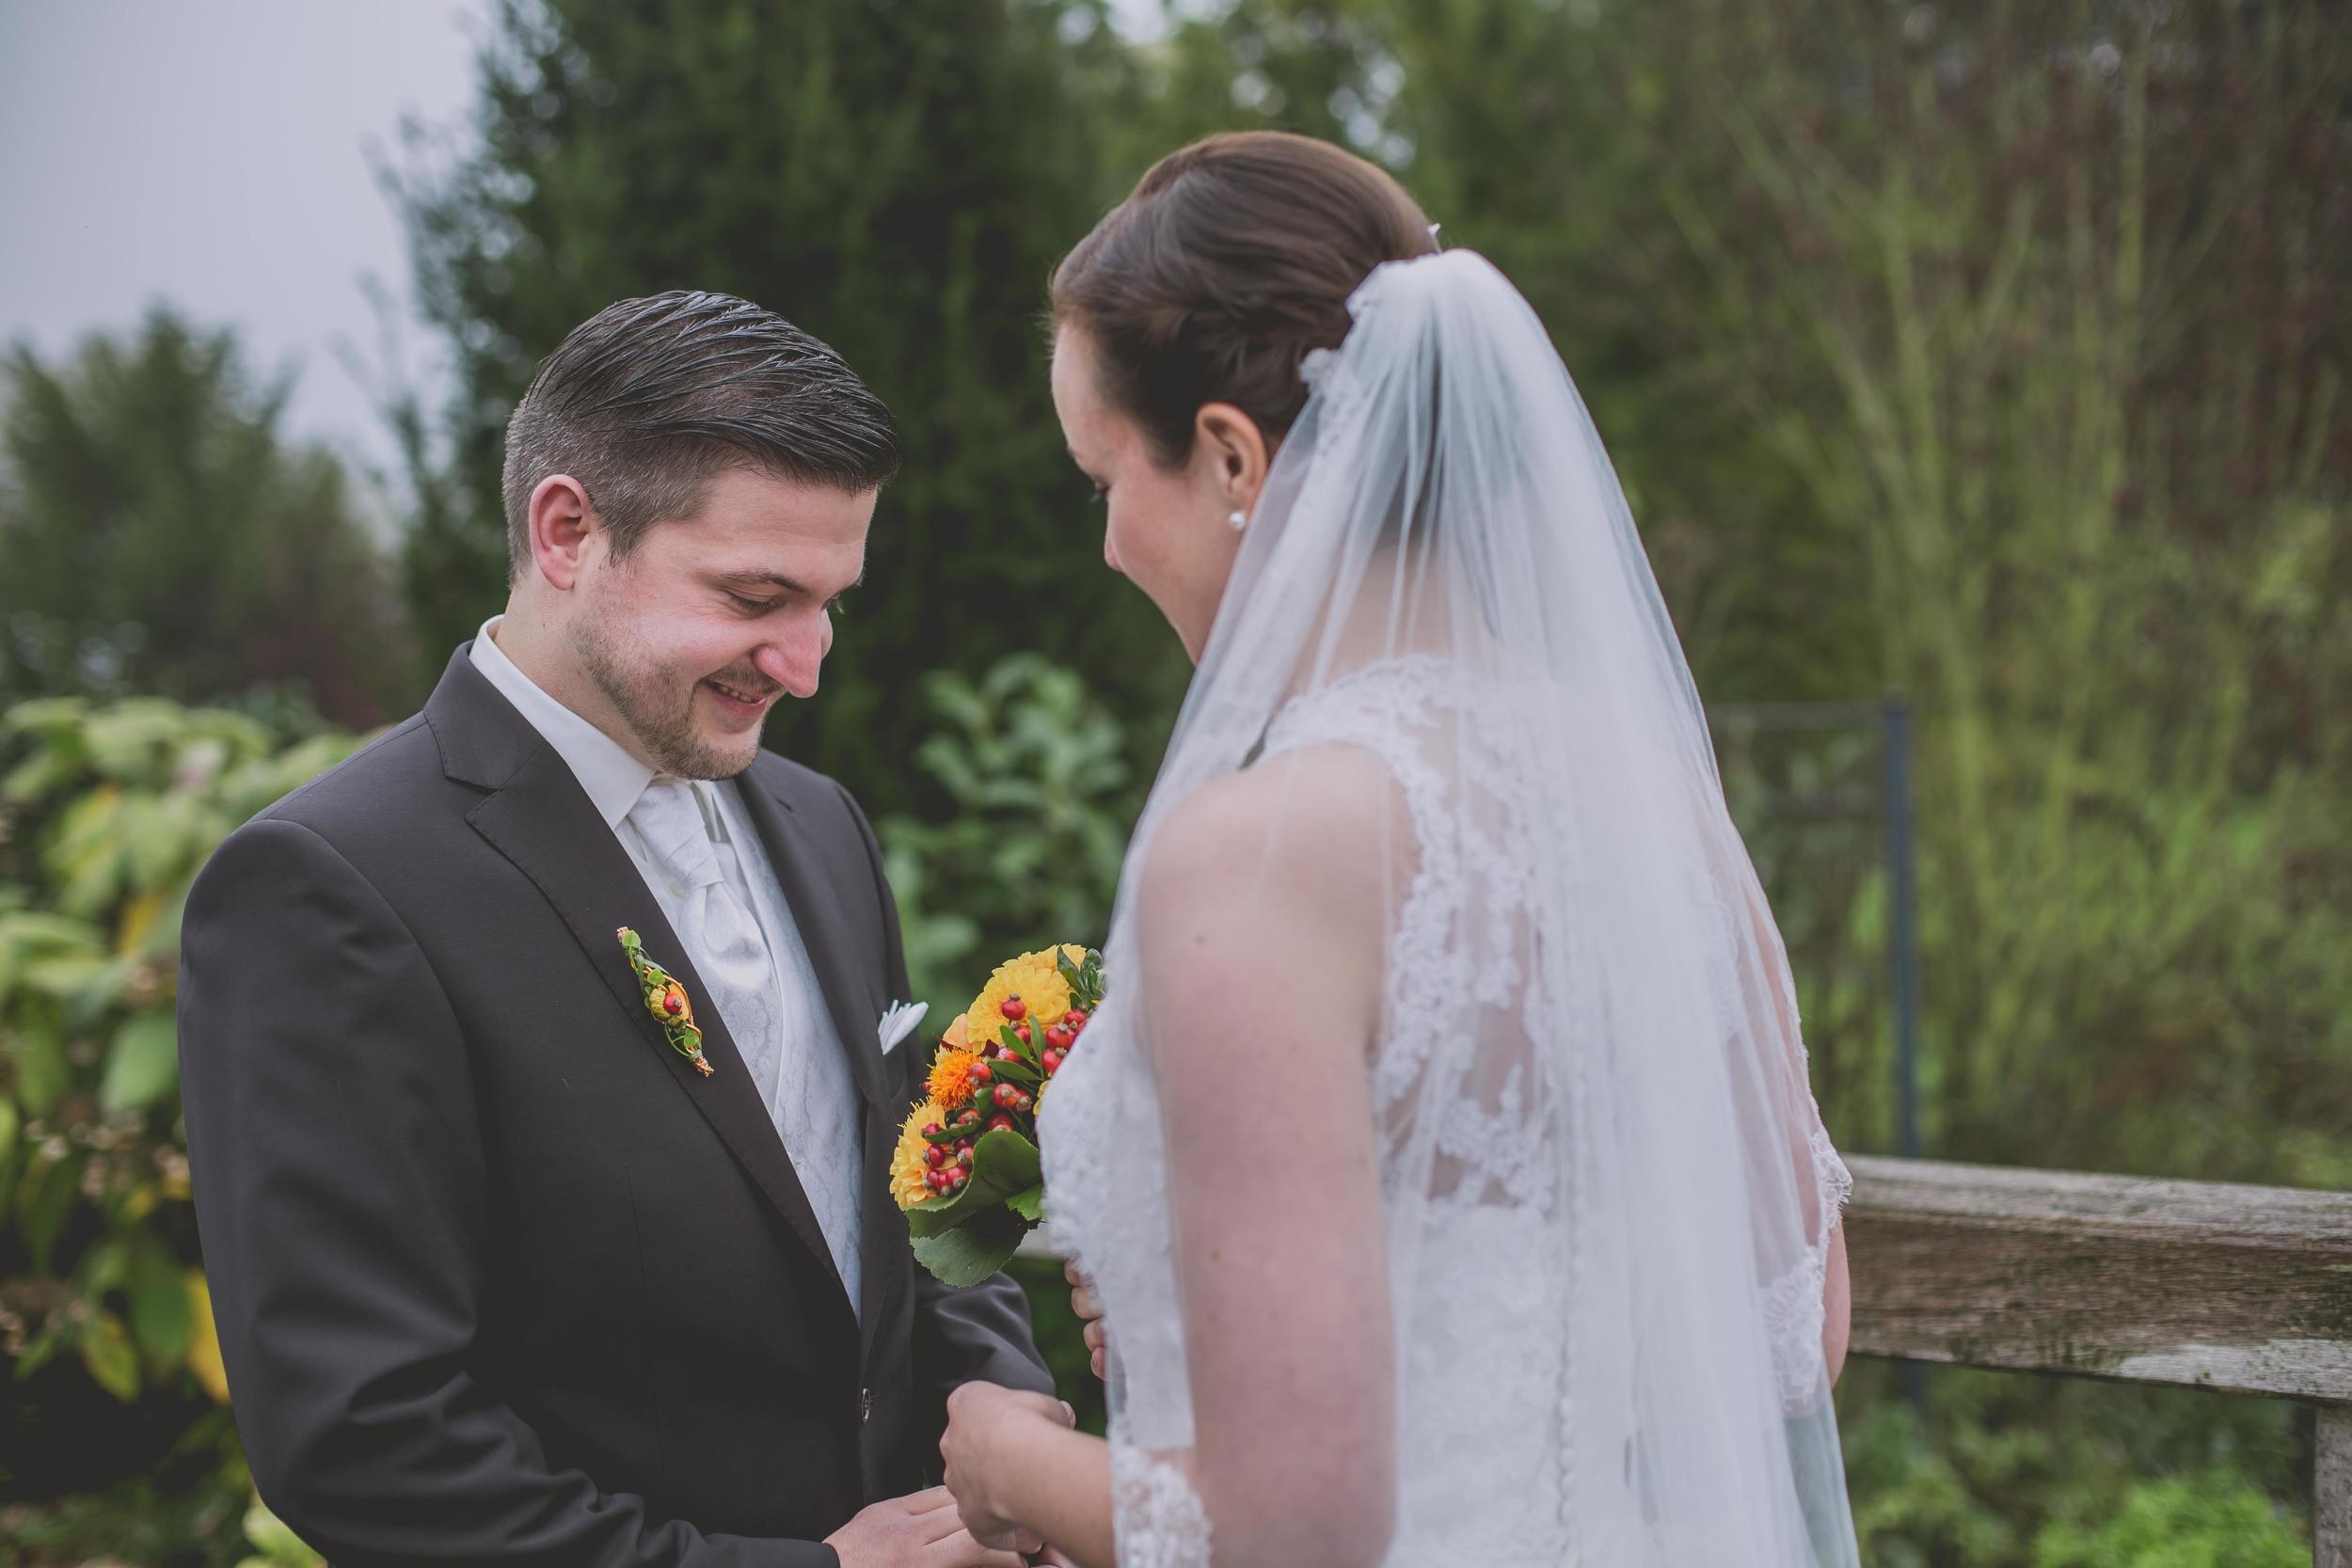 Buffalo-Wedding-Photography-by-Stefan-Ludwig10252014WEB-21.jpg